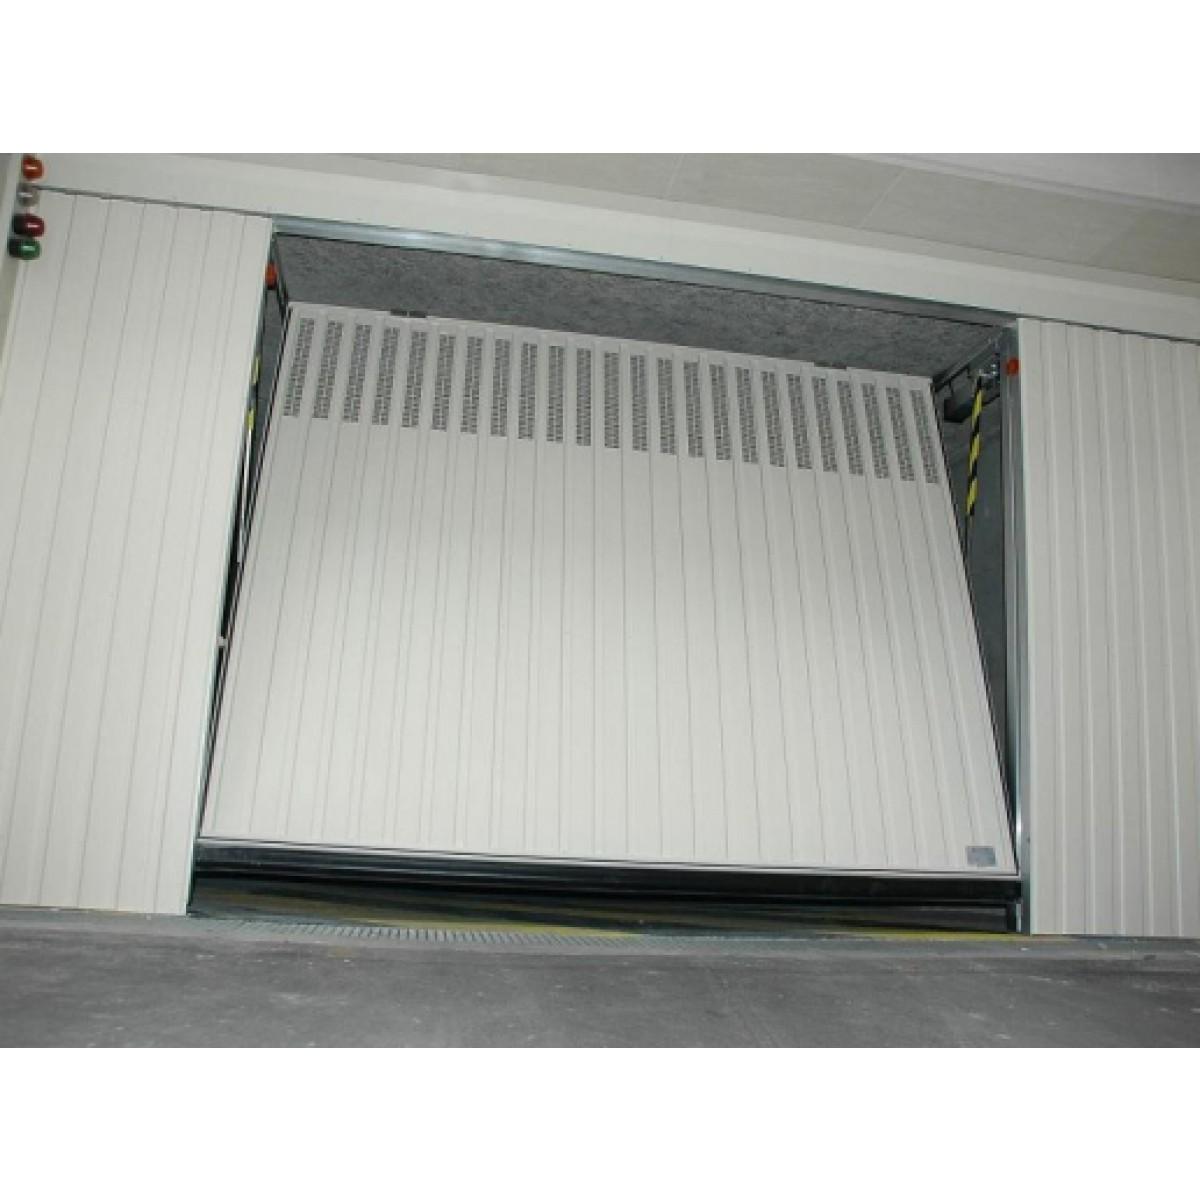 Portes de garage basculantes s400 a ro pluo portes de parking collectifs - Securisation porte garage basculante ...